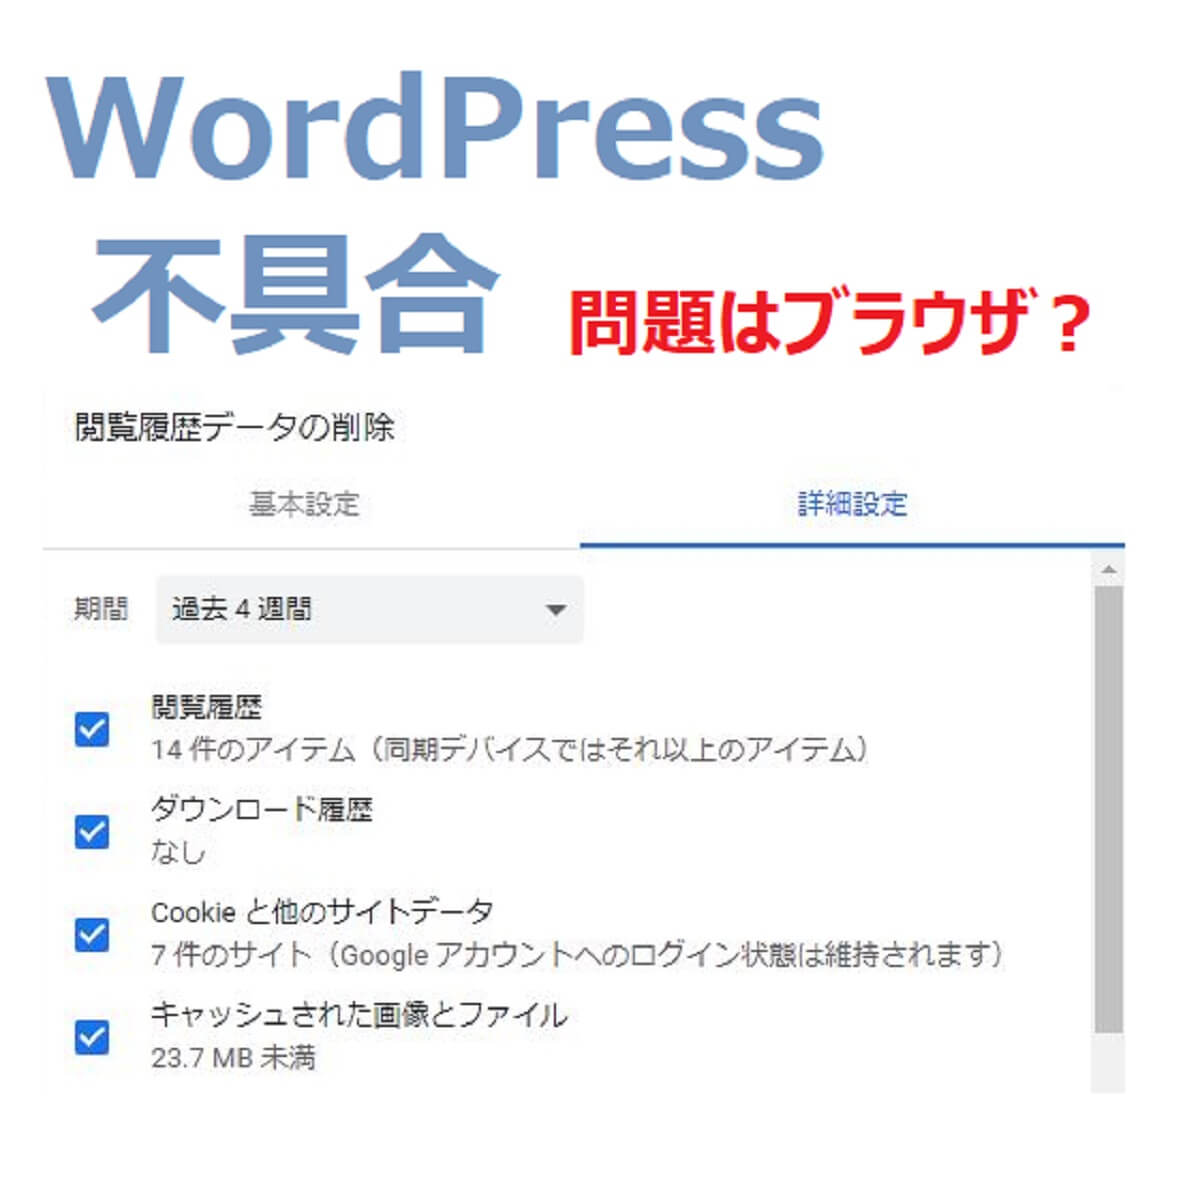 WordPressの不具合。問題はブラウザ?